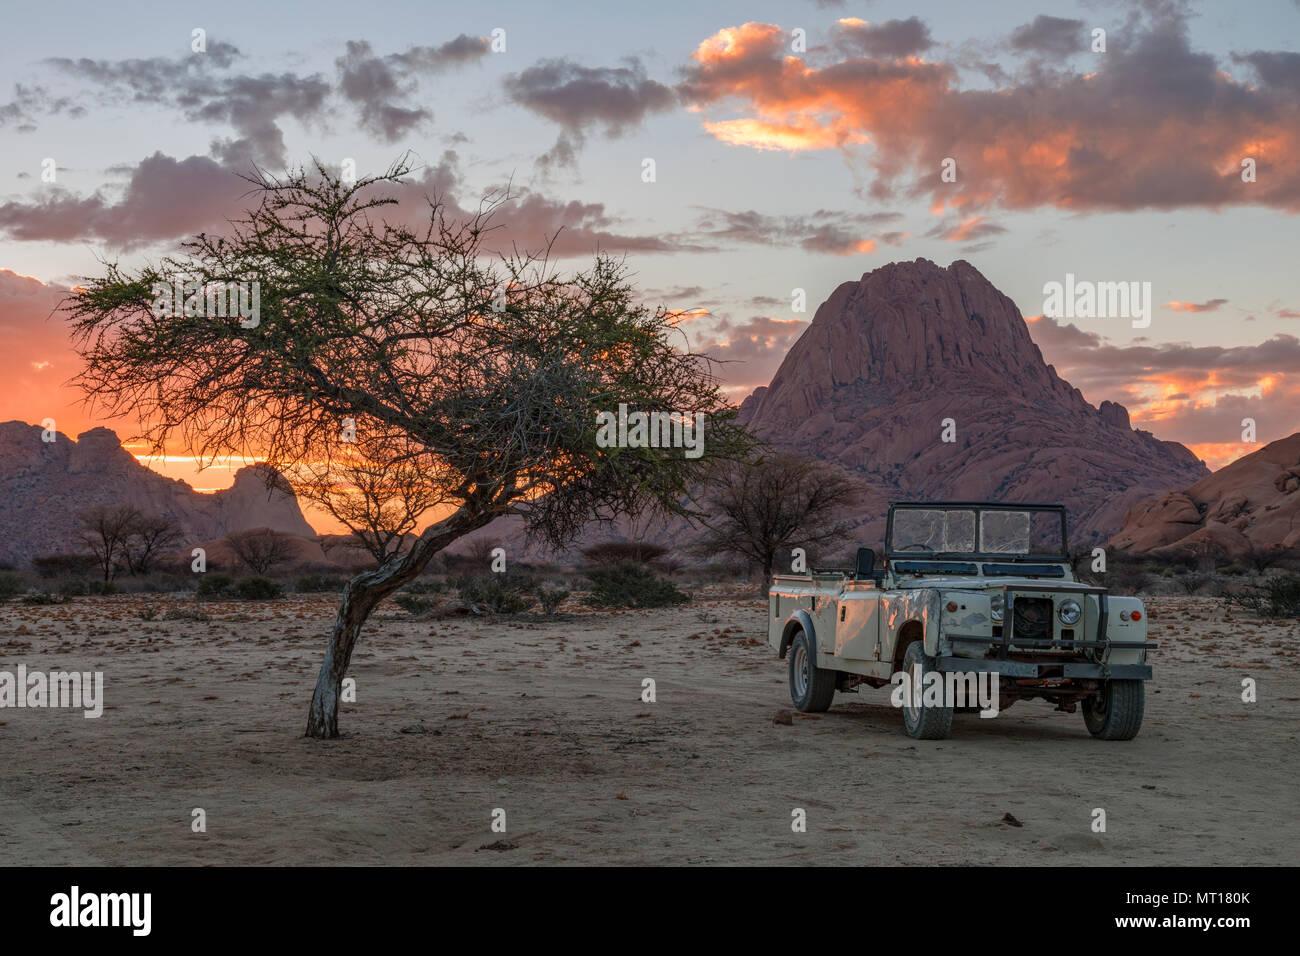 Spitzkoppe, Usakos, Namibia, Africa Immagini Stock